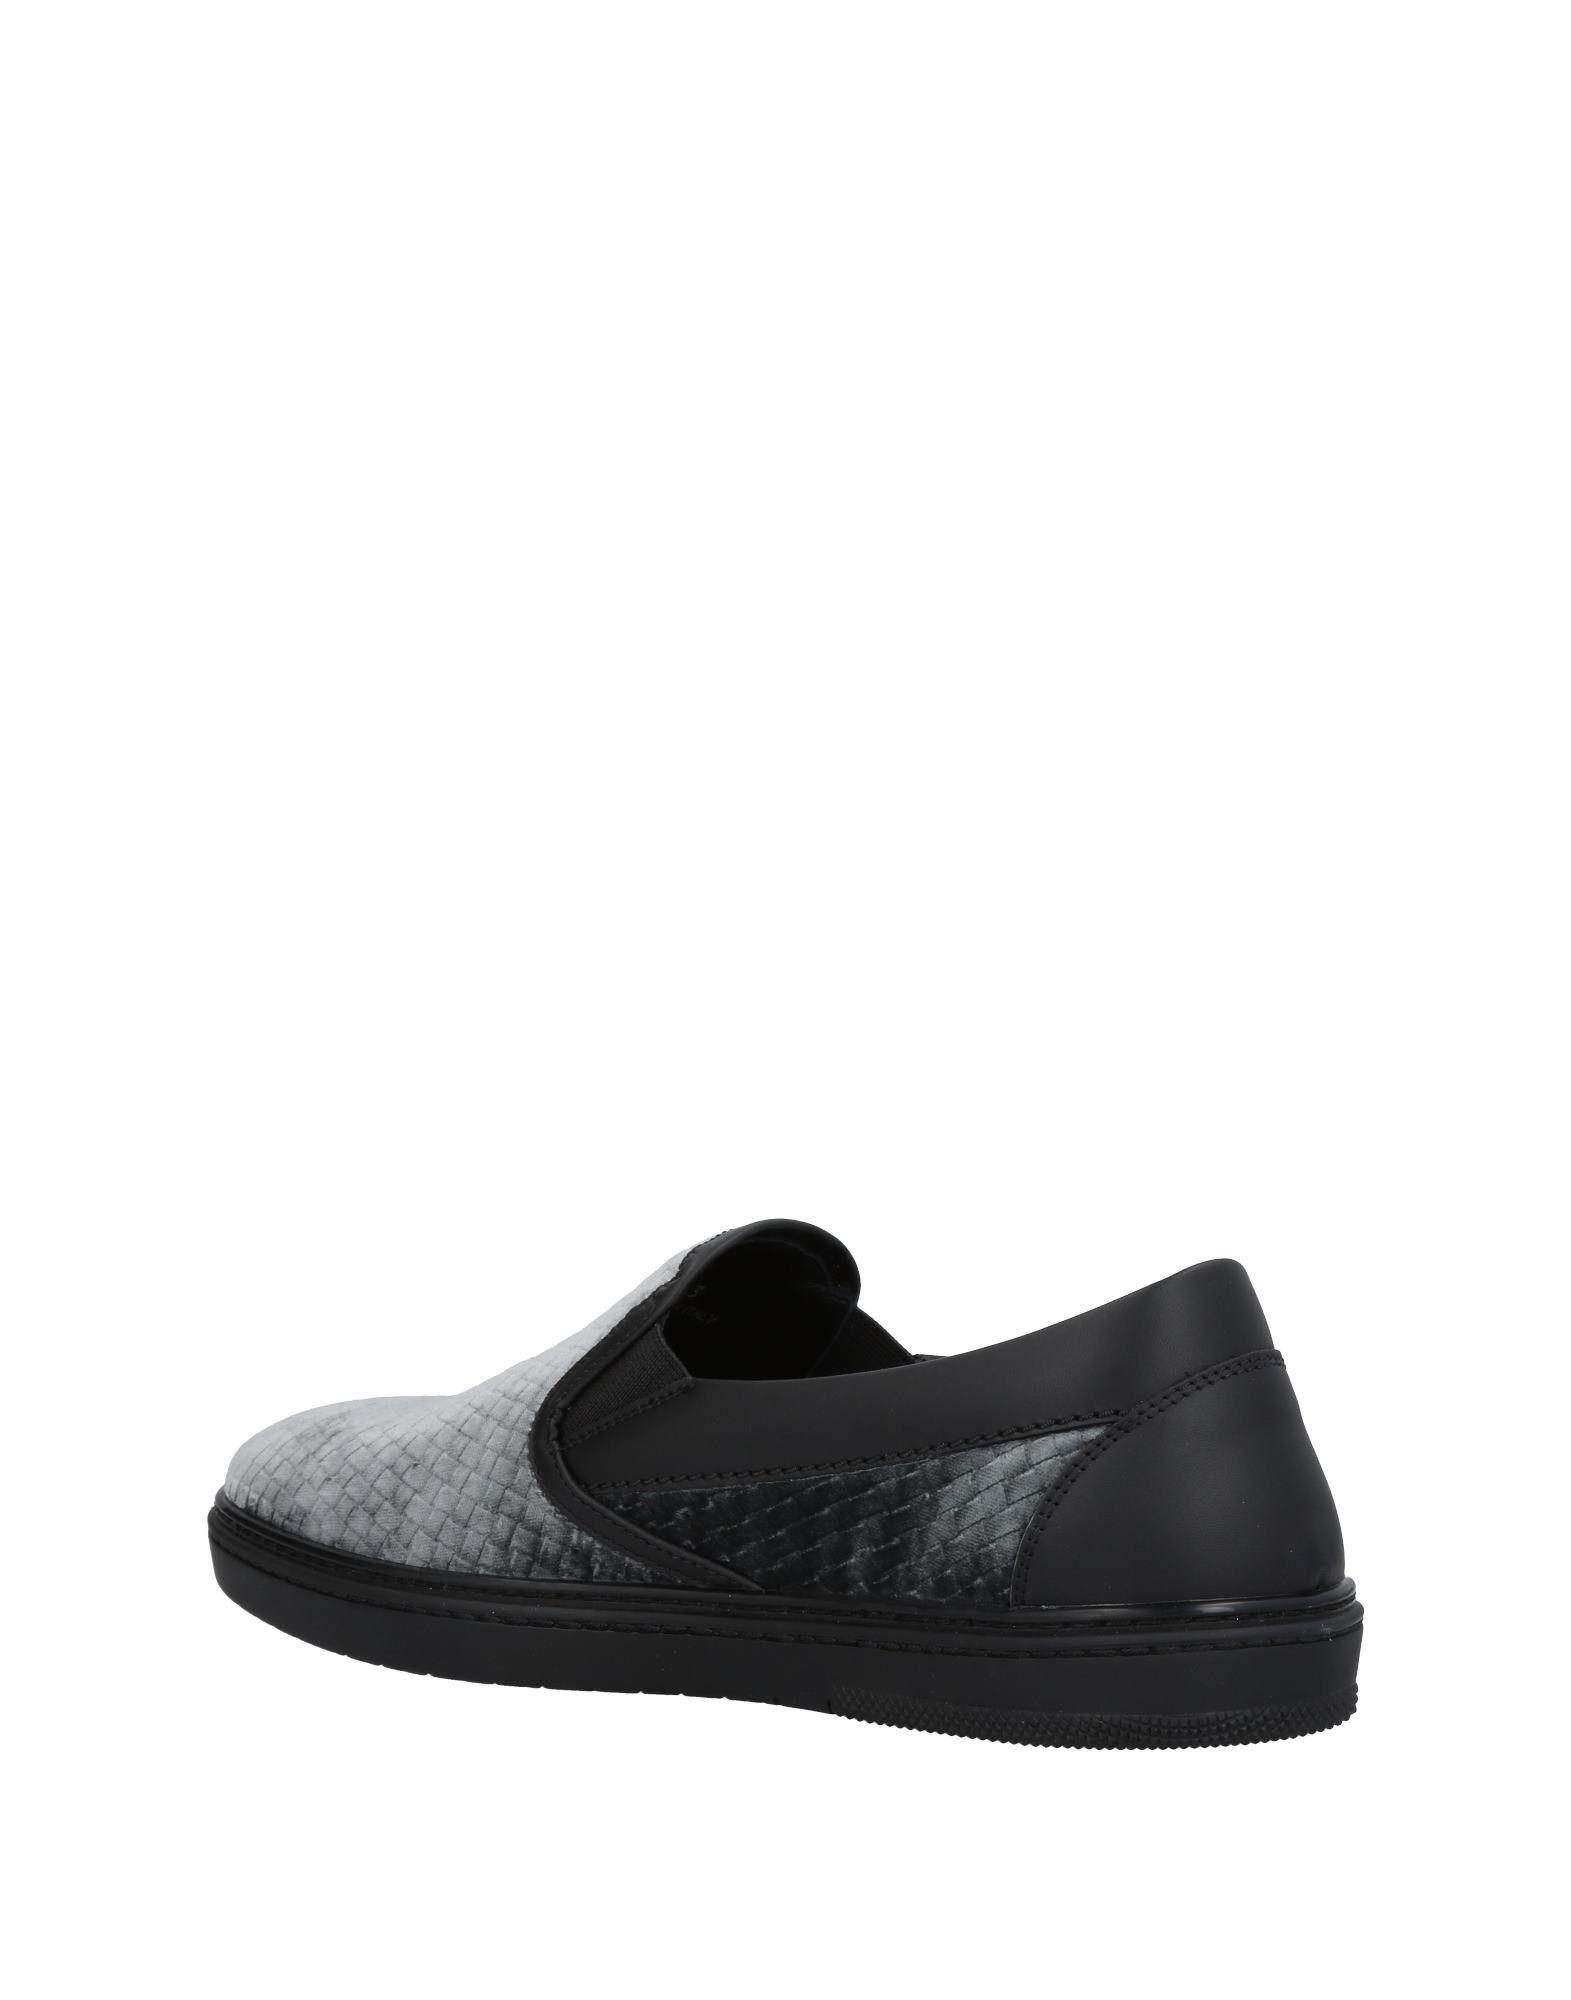 Jimmy Choo Gute Sneakers Herren  11462007LJ Gute Choo Qualität beliebte Schuhe 6e9b4e